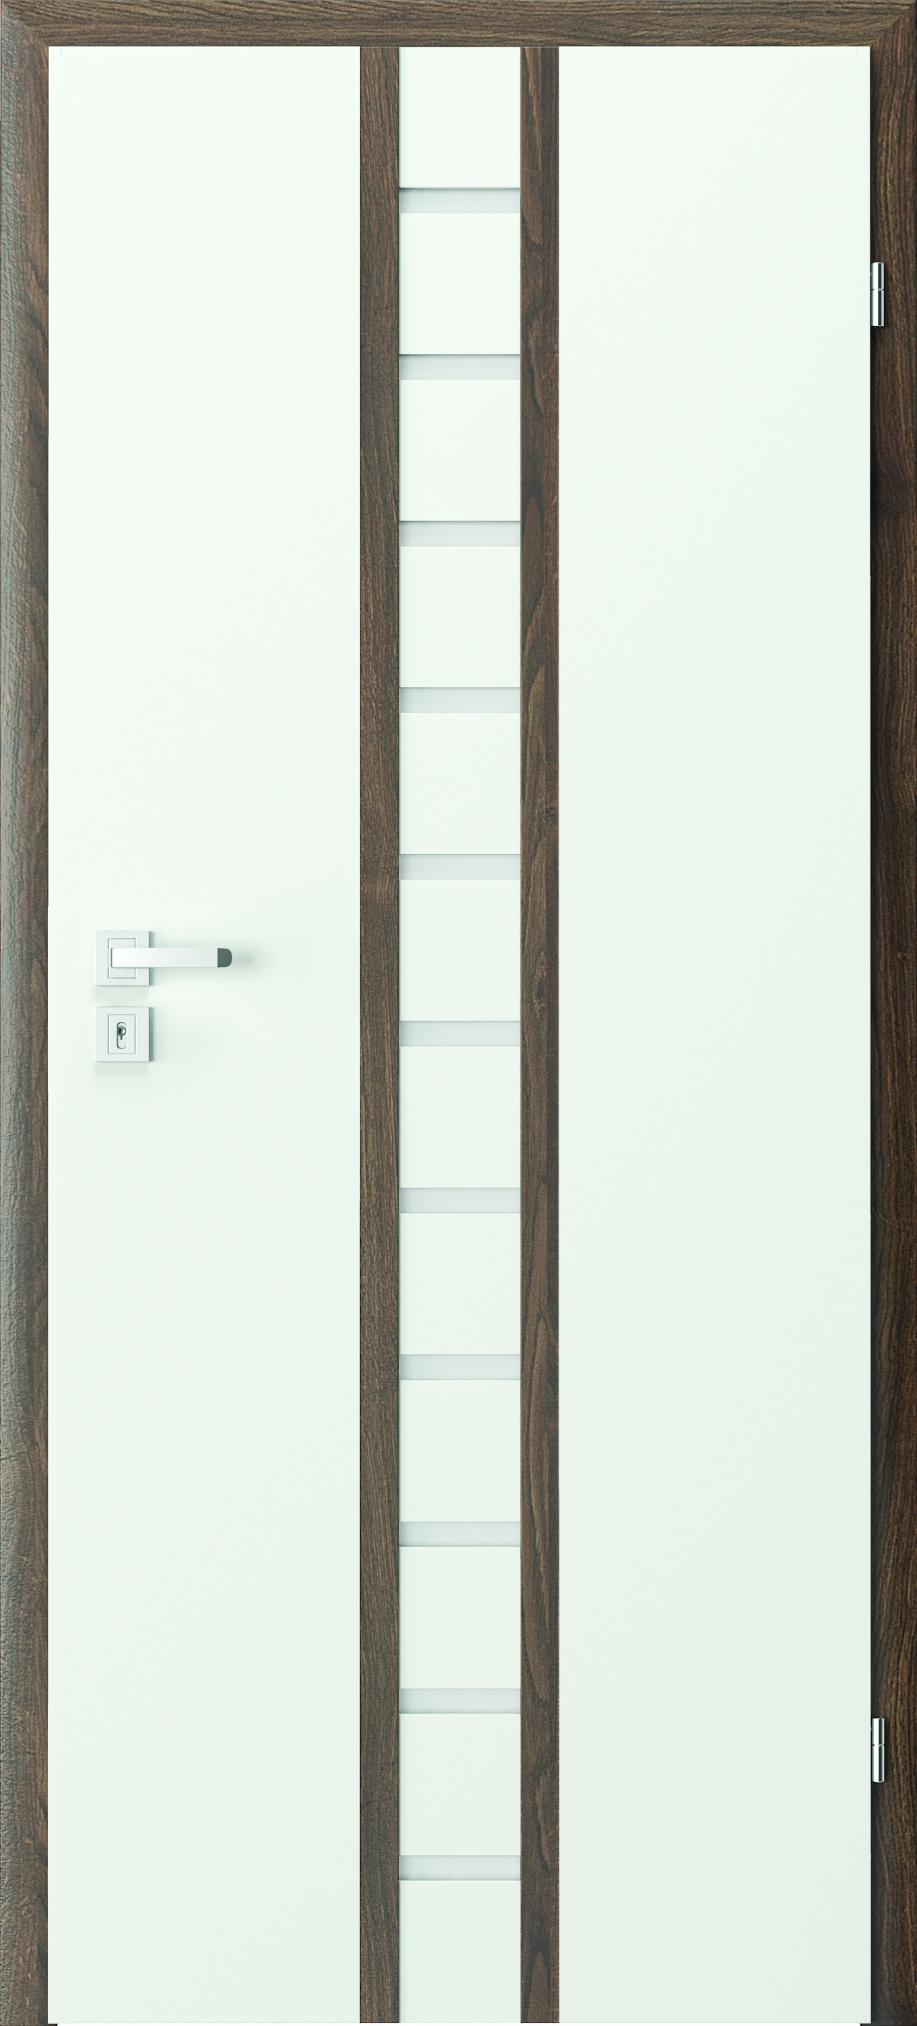 Dvere Porta Pasky, model 5